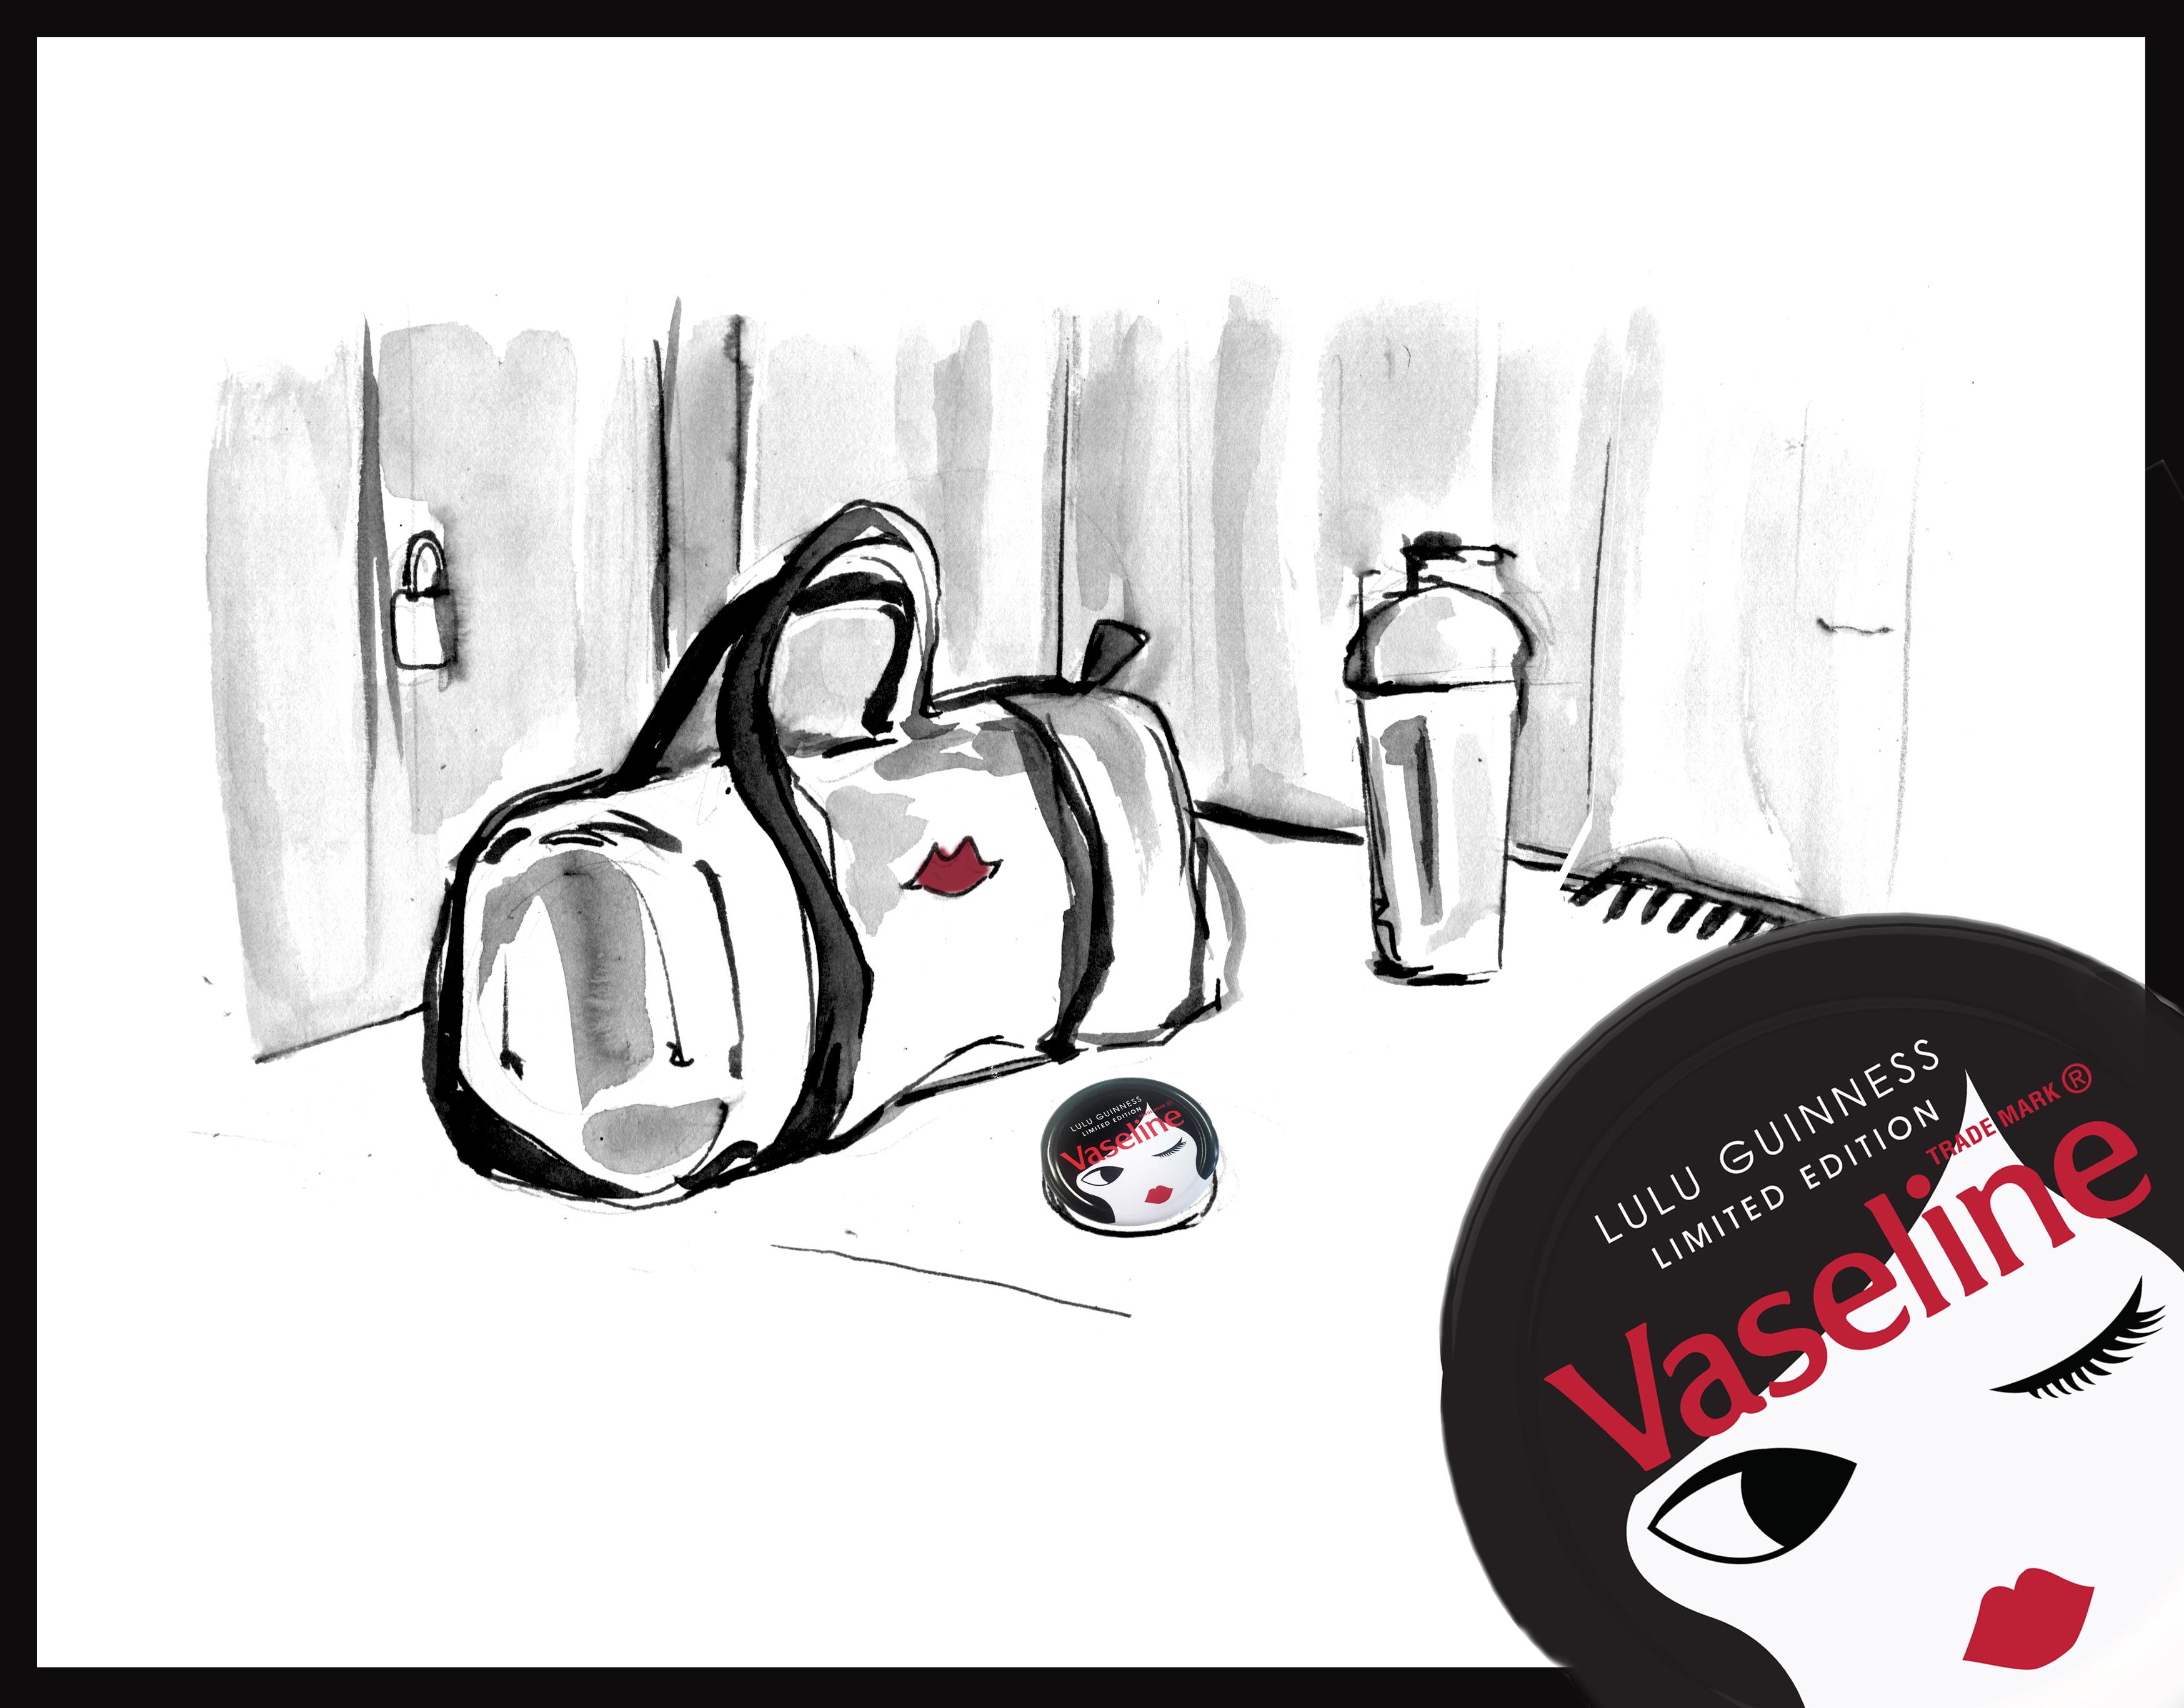 Vaseline - Gym